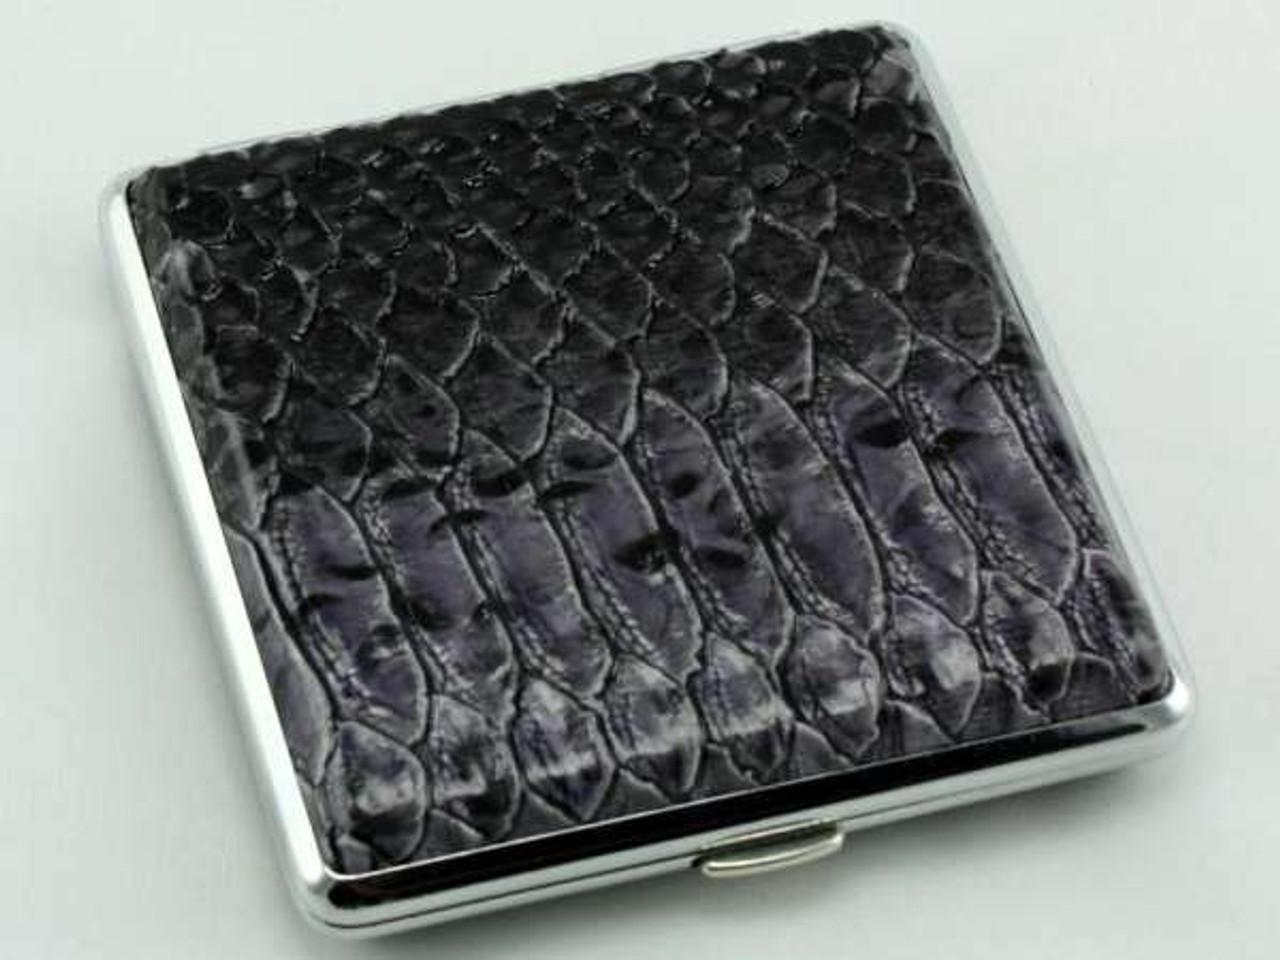 Grey Snakeskin Leather Cigarette Case